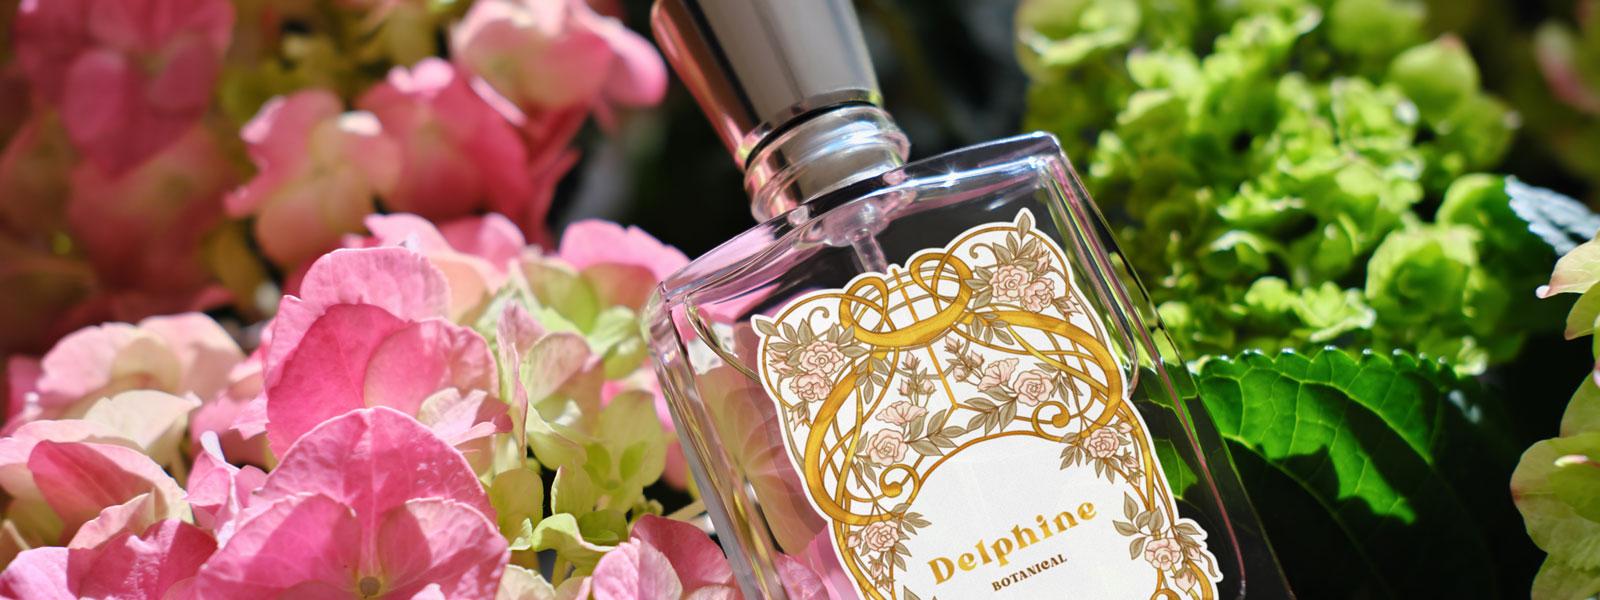 perfume bottle label printing